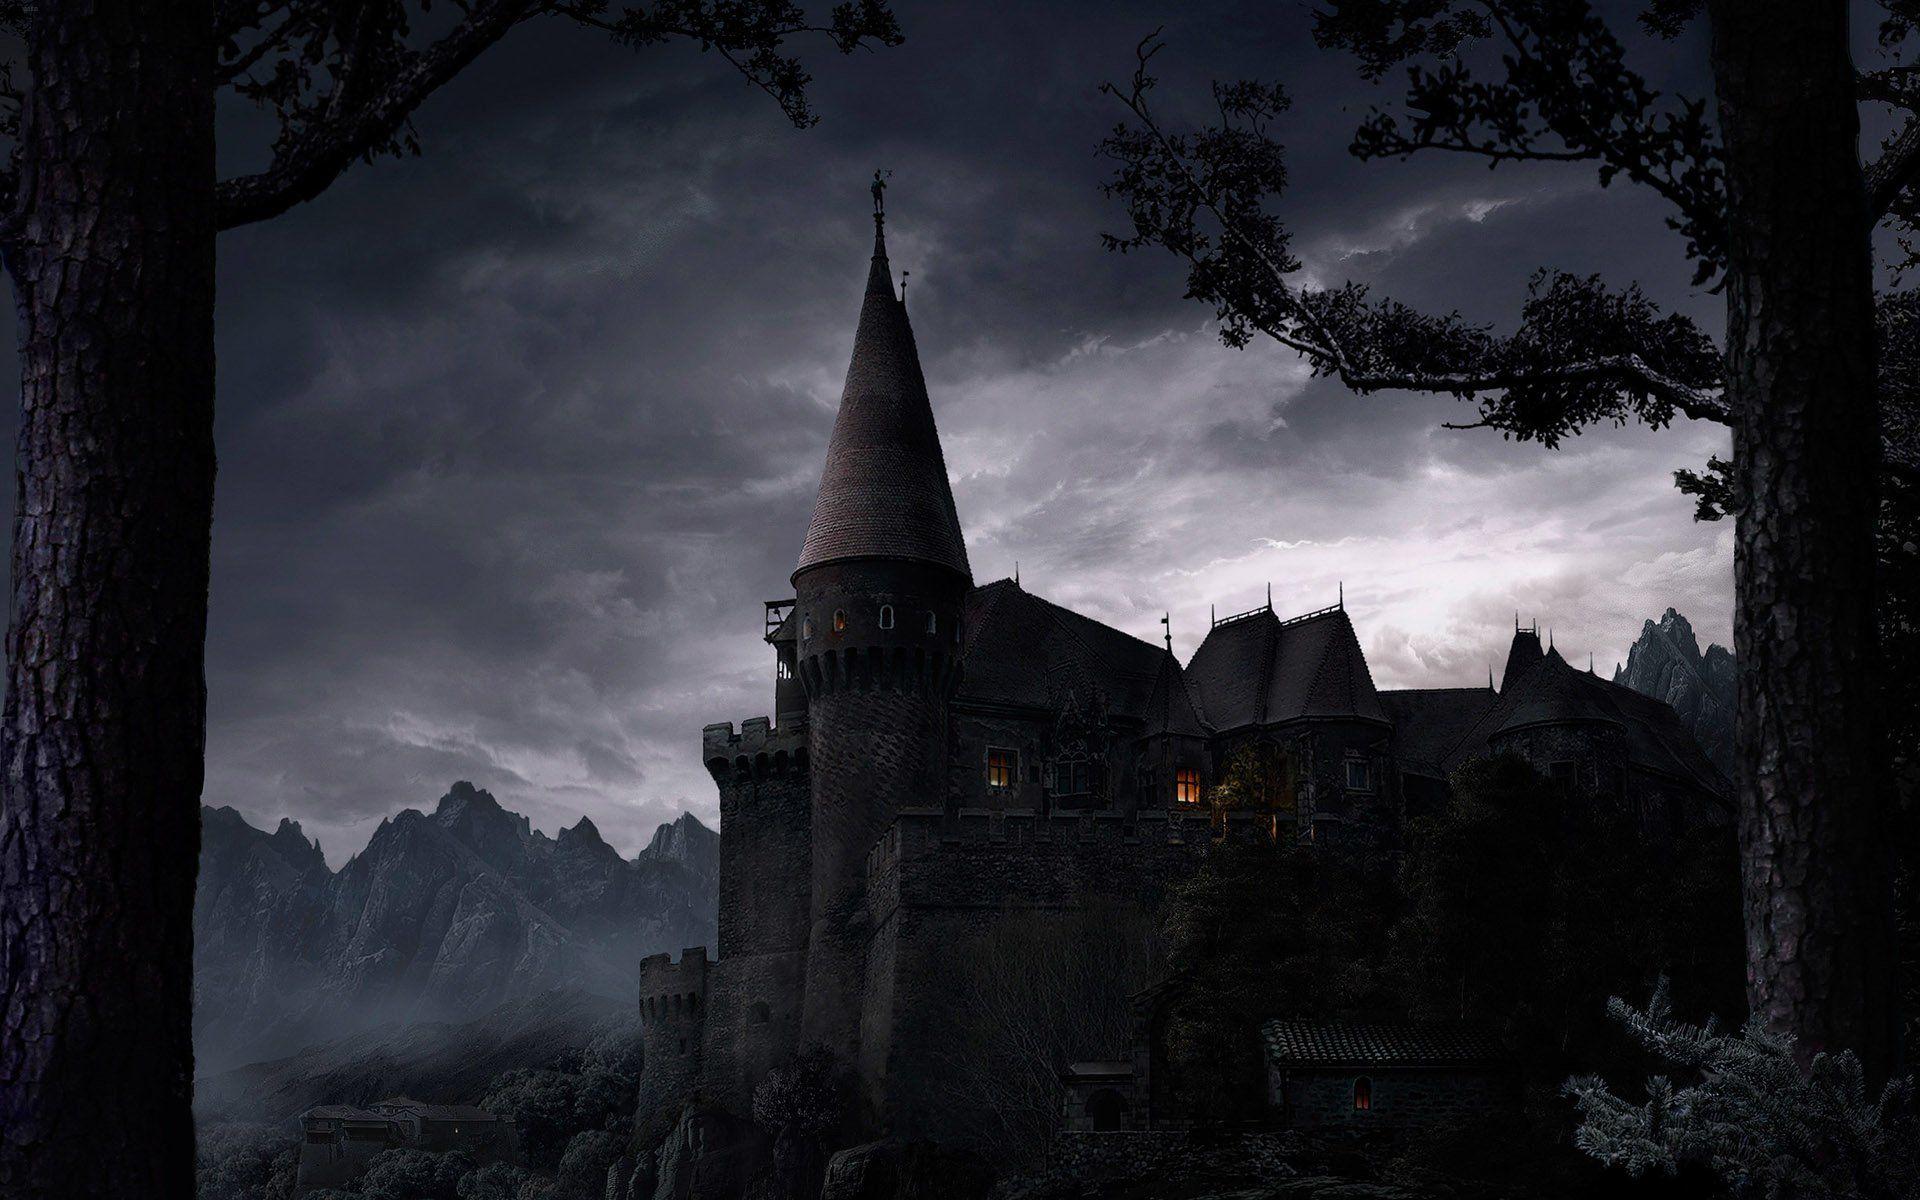 Related Image Dark Castle Fantasy Castle Dark Fantasy Art